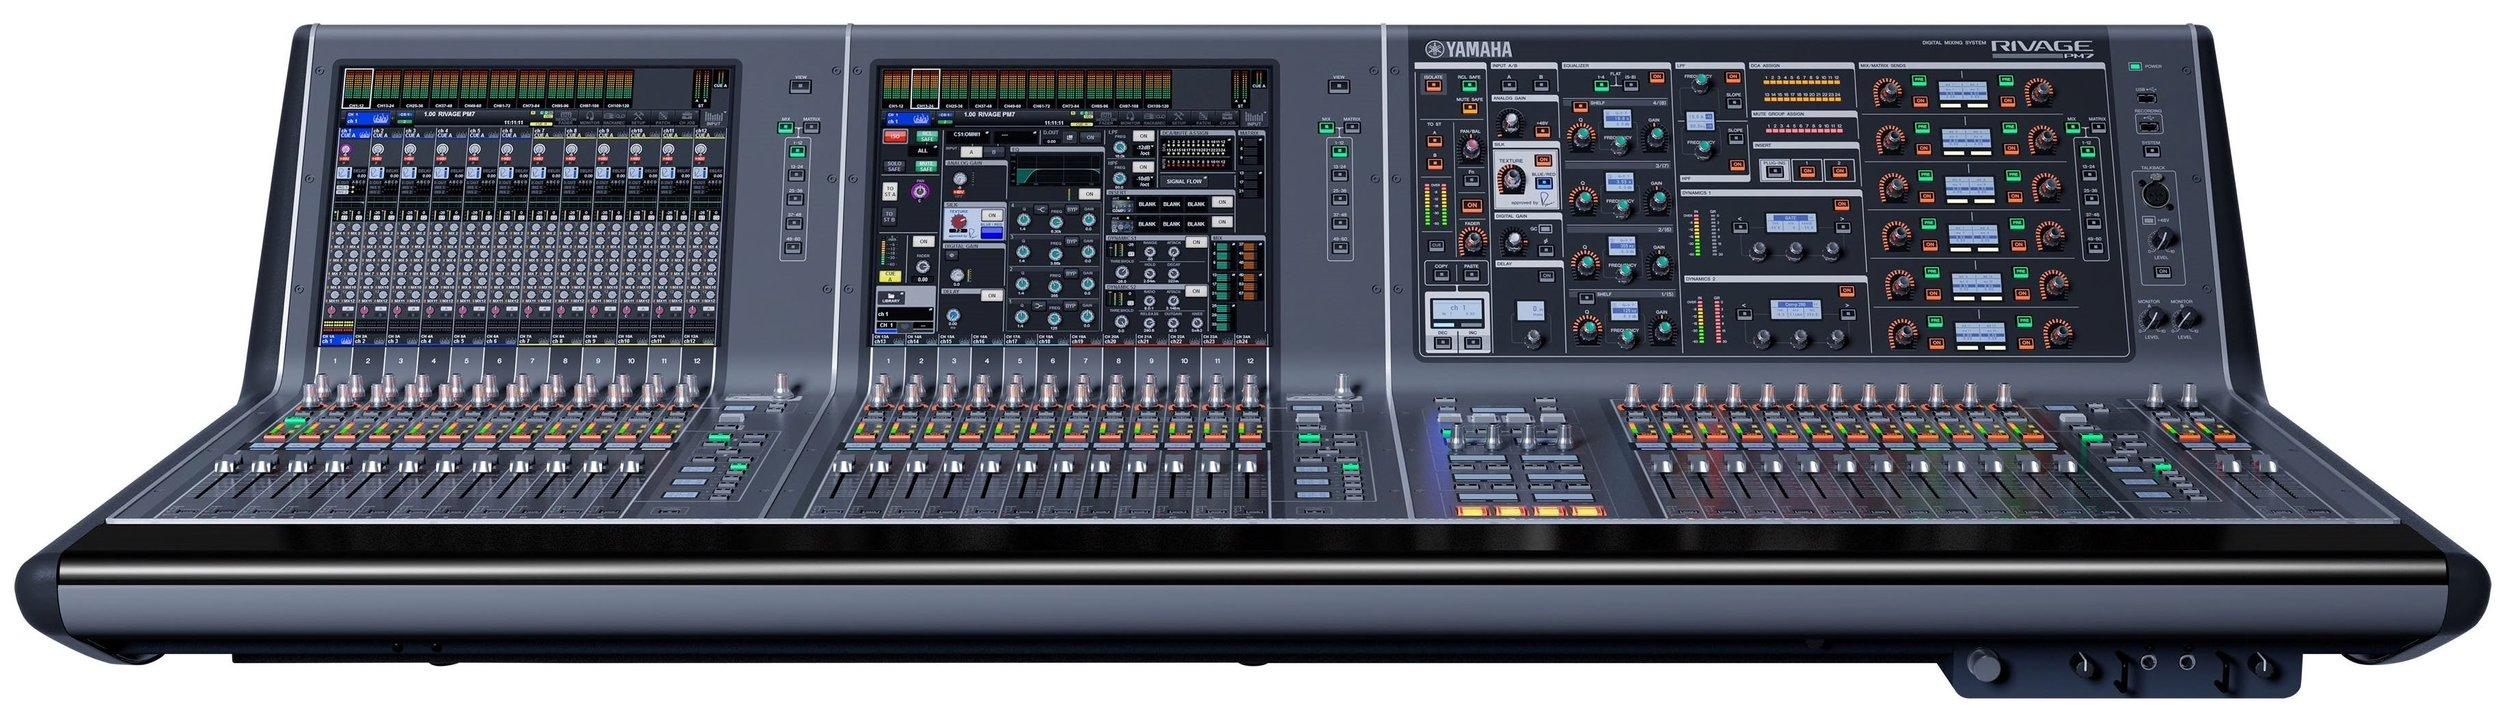 Yamaha PM7 mixing desk